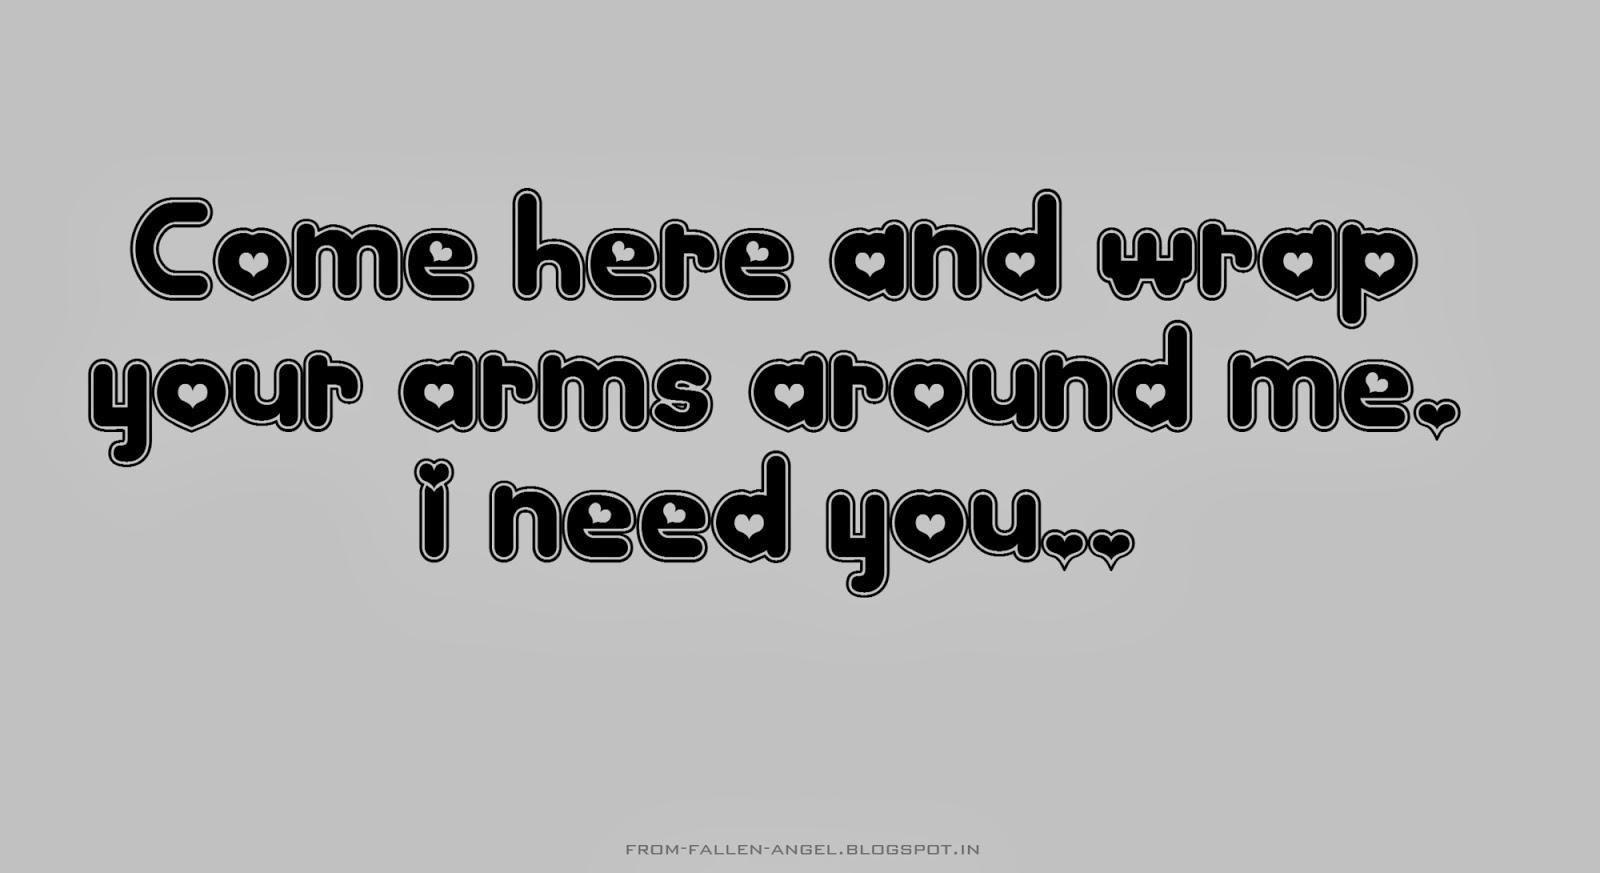 long distance i need you